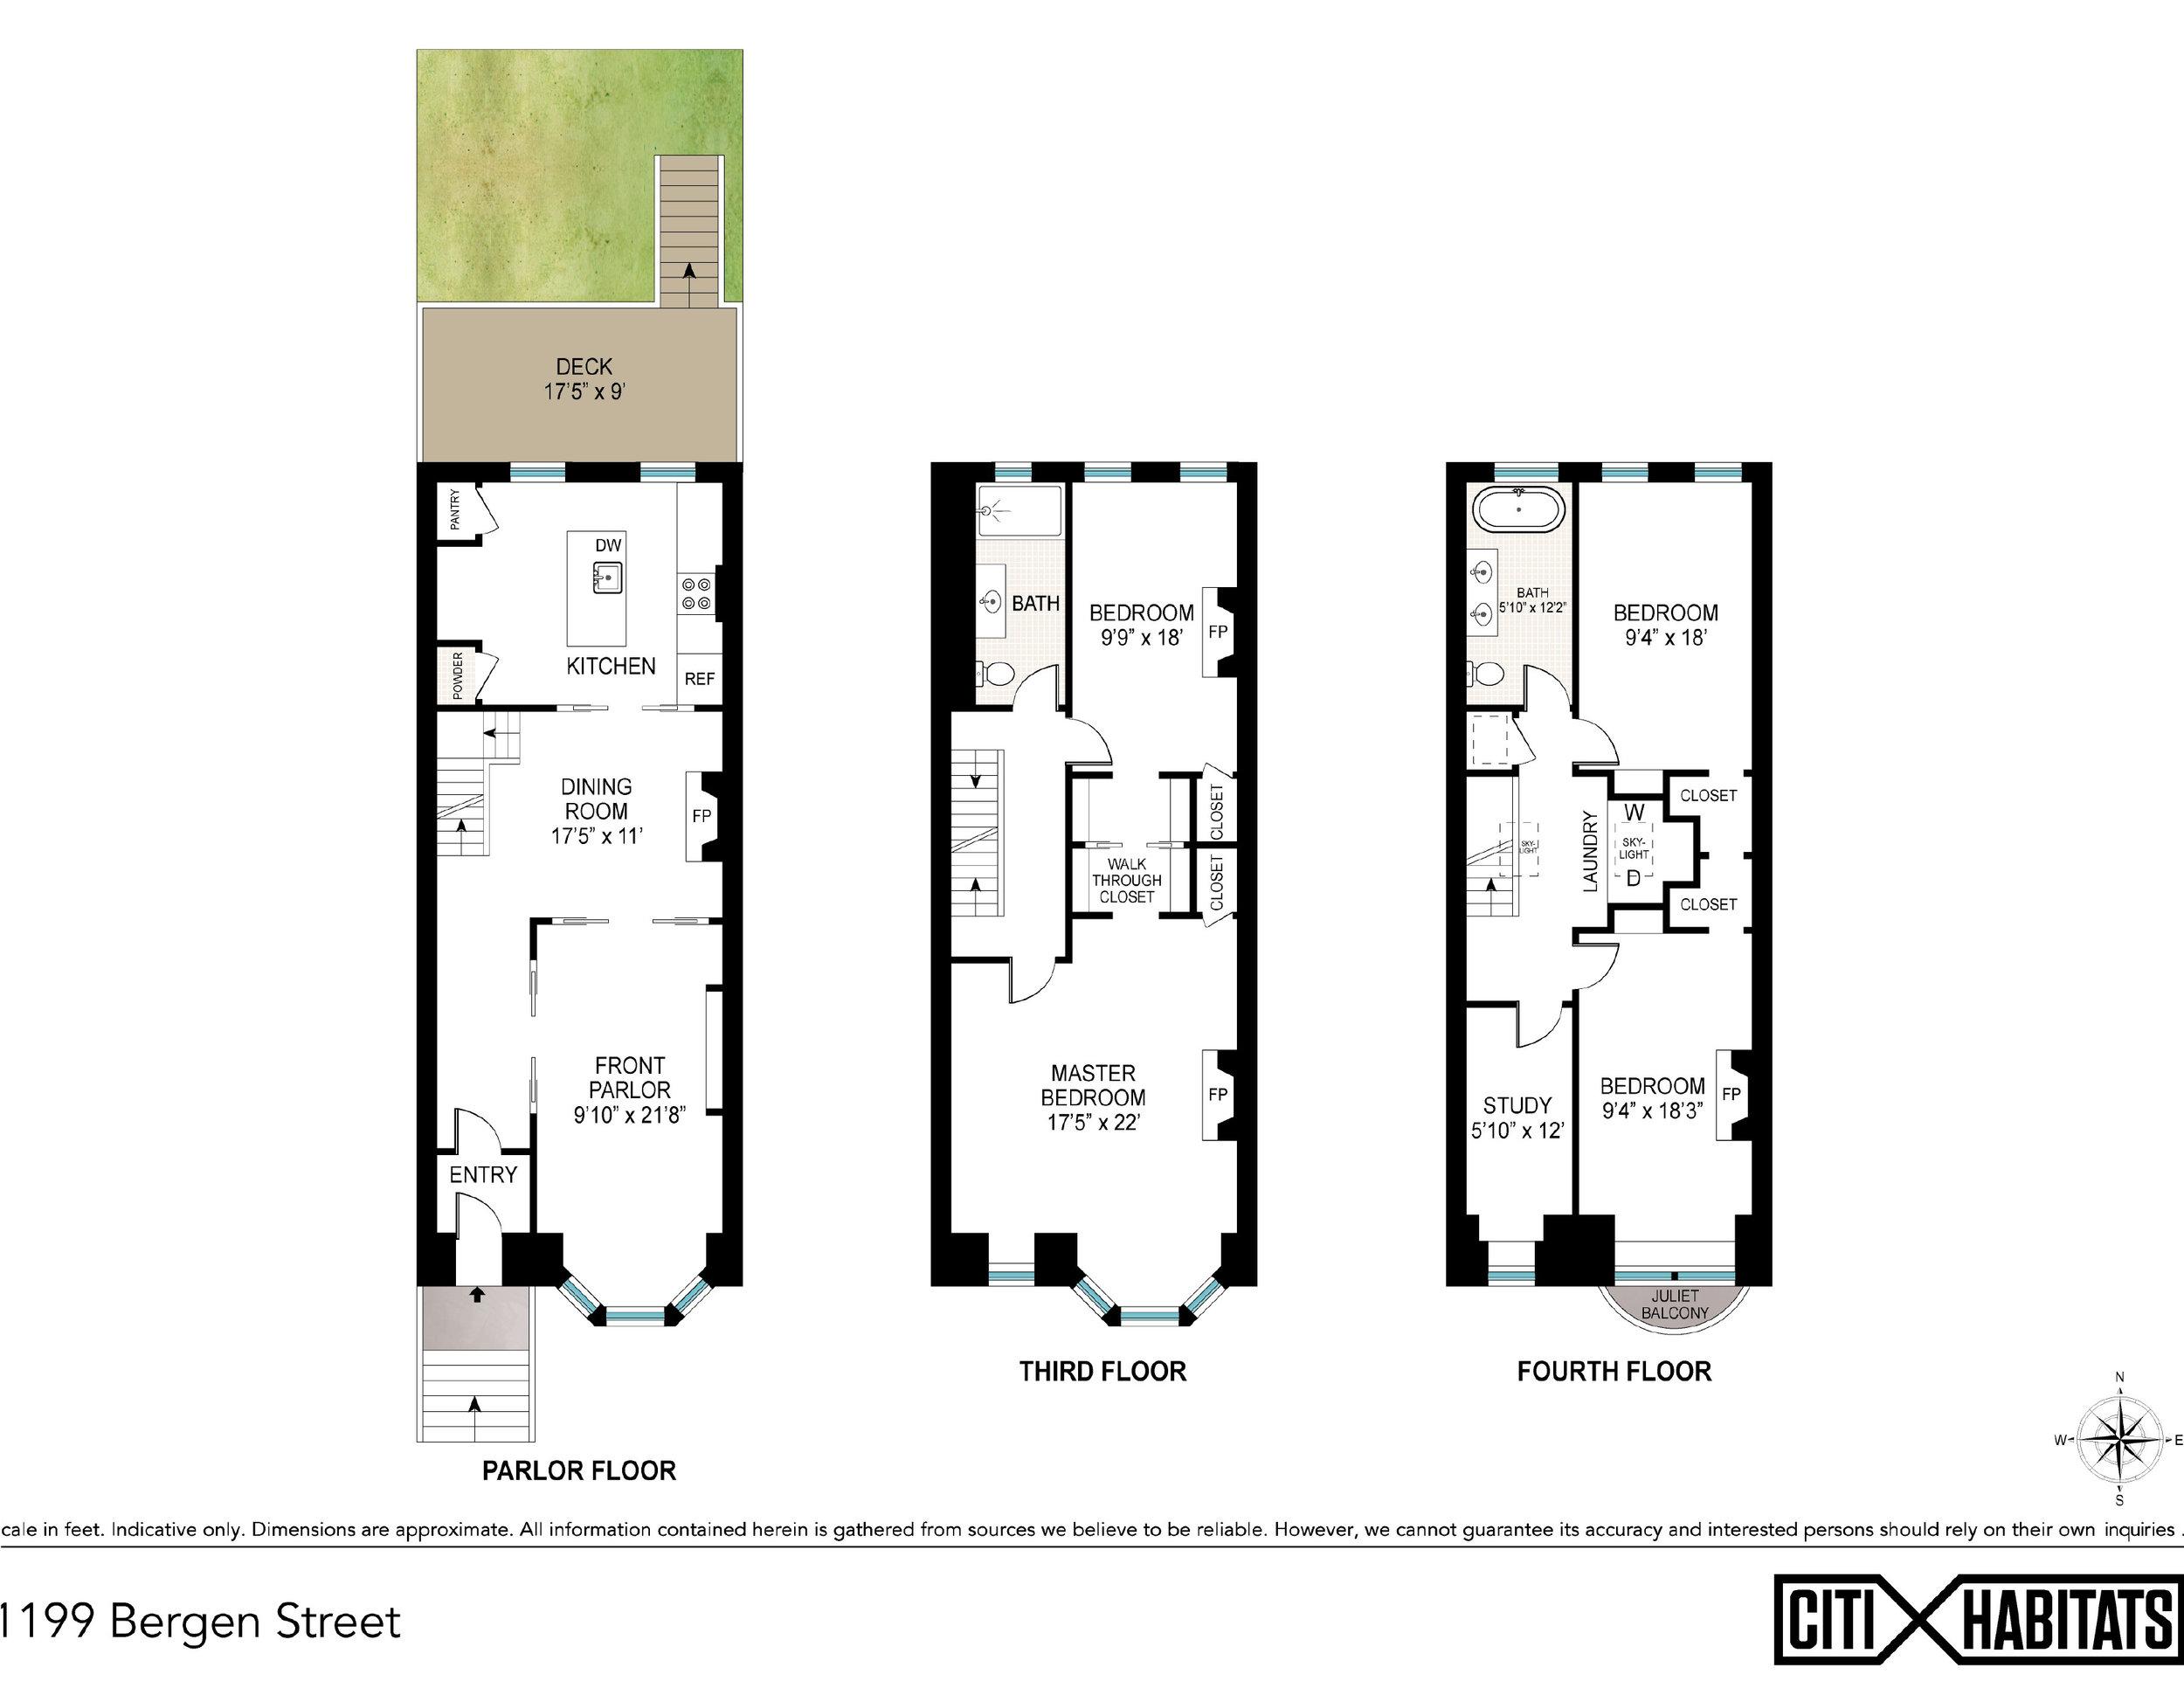 1199 Bergen floorplan.jpg